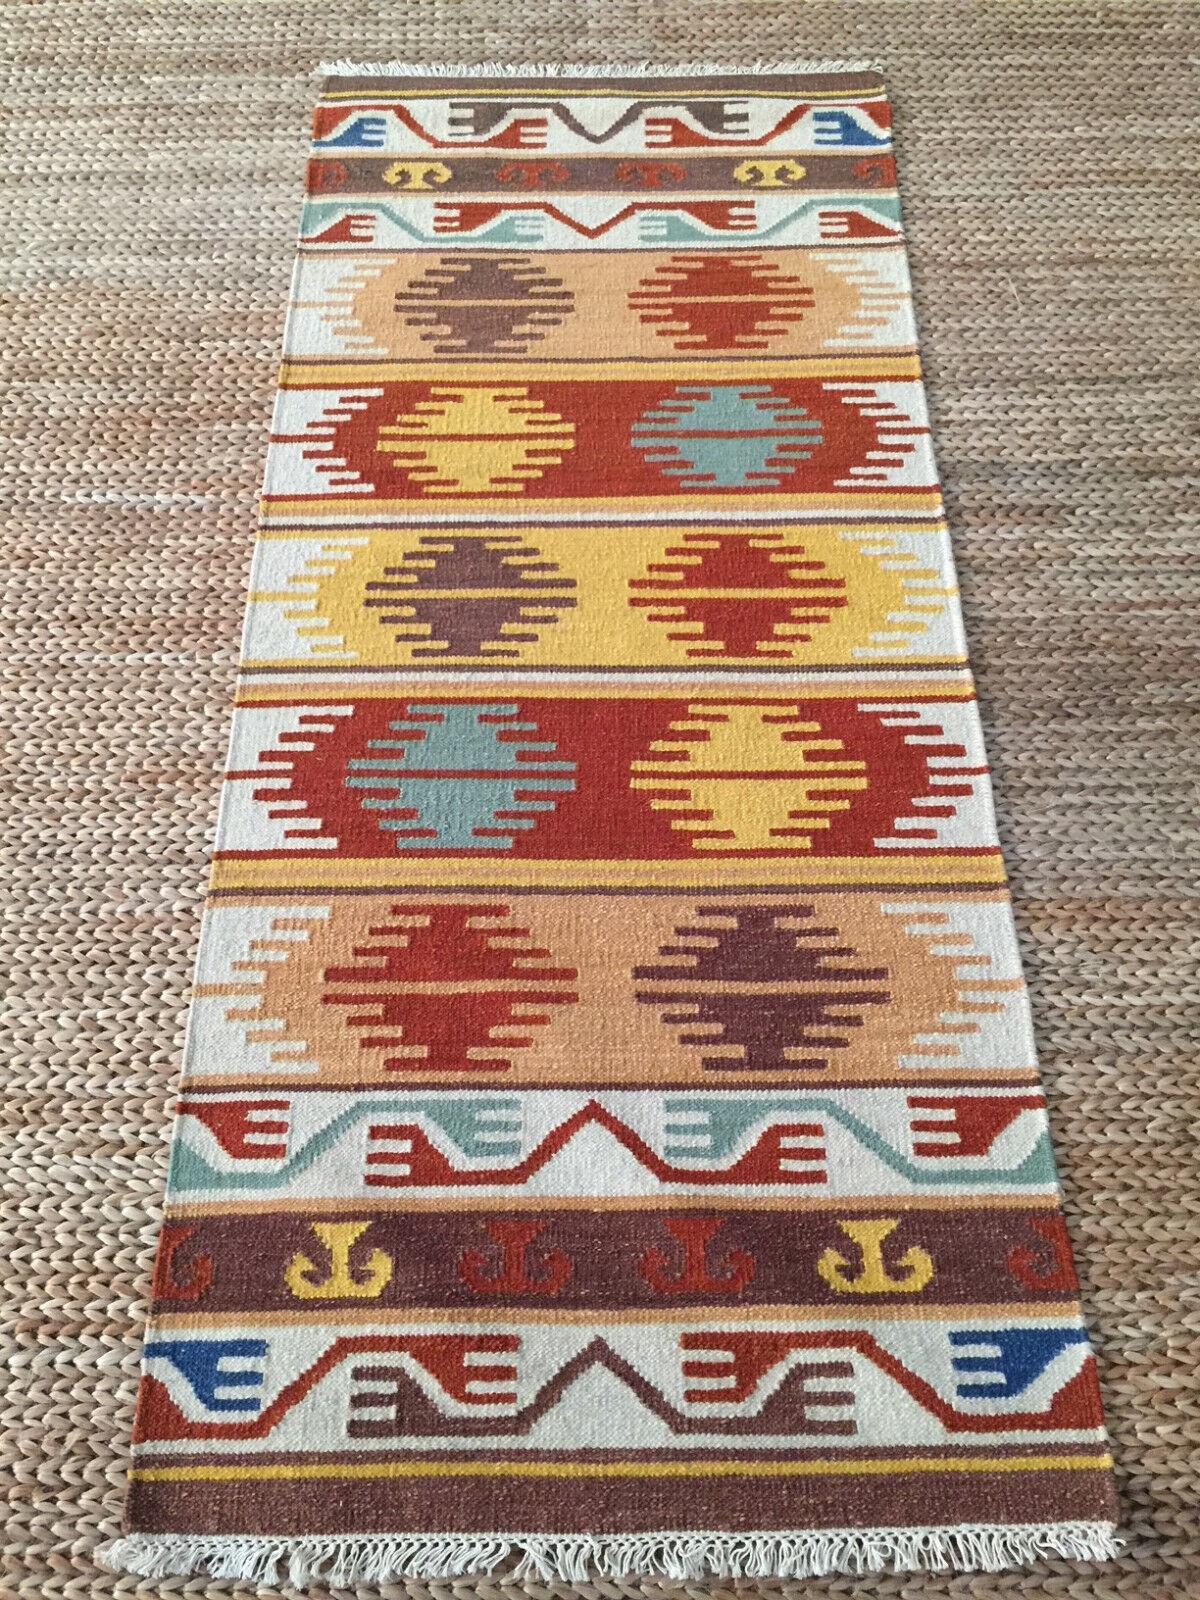 2'6x6 Wool Kilim Hand Woven Flat Weave Tribal Rug Southwestern Reversible. NEW